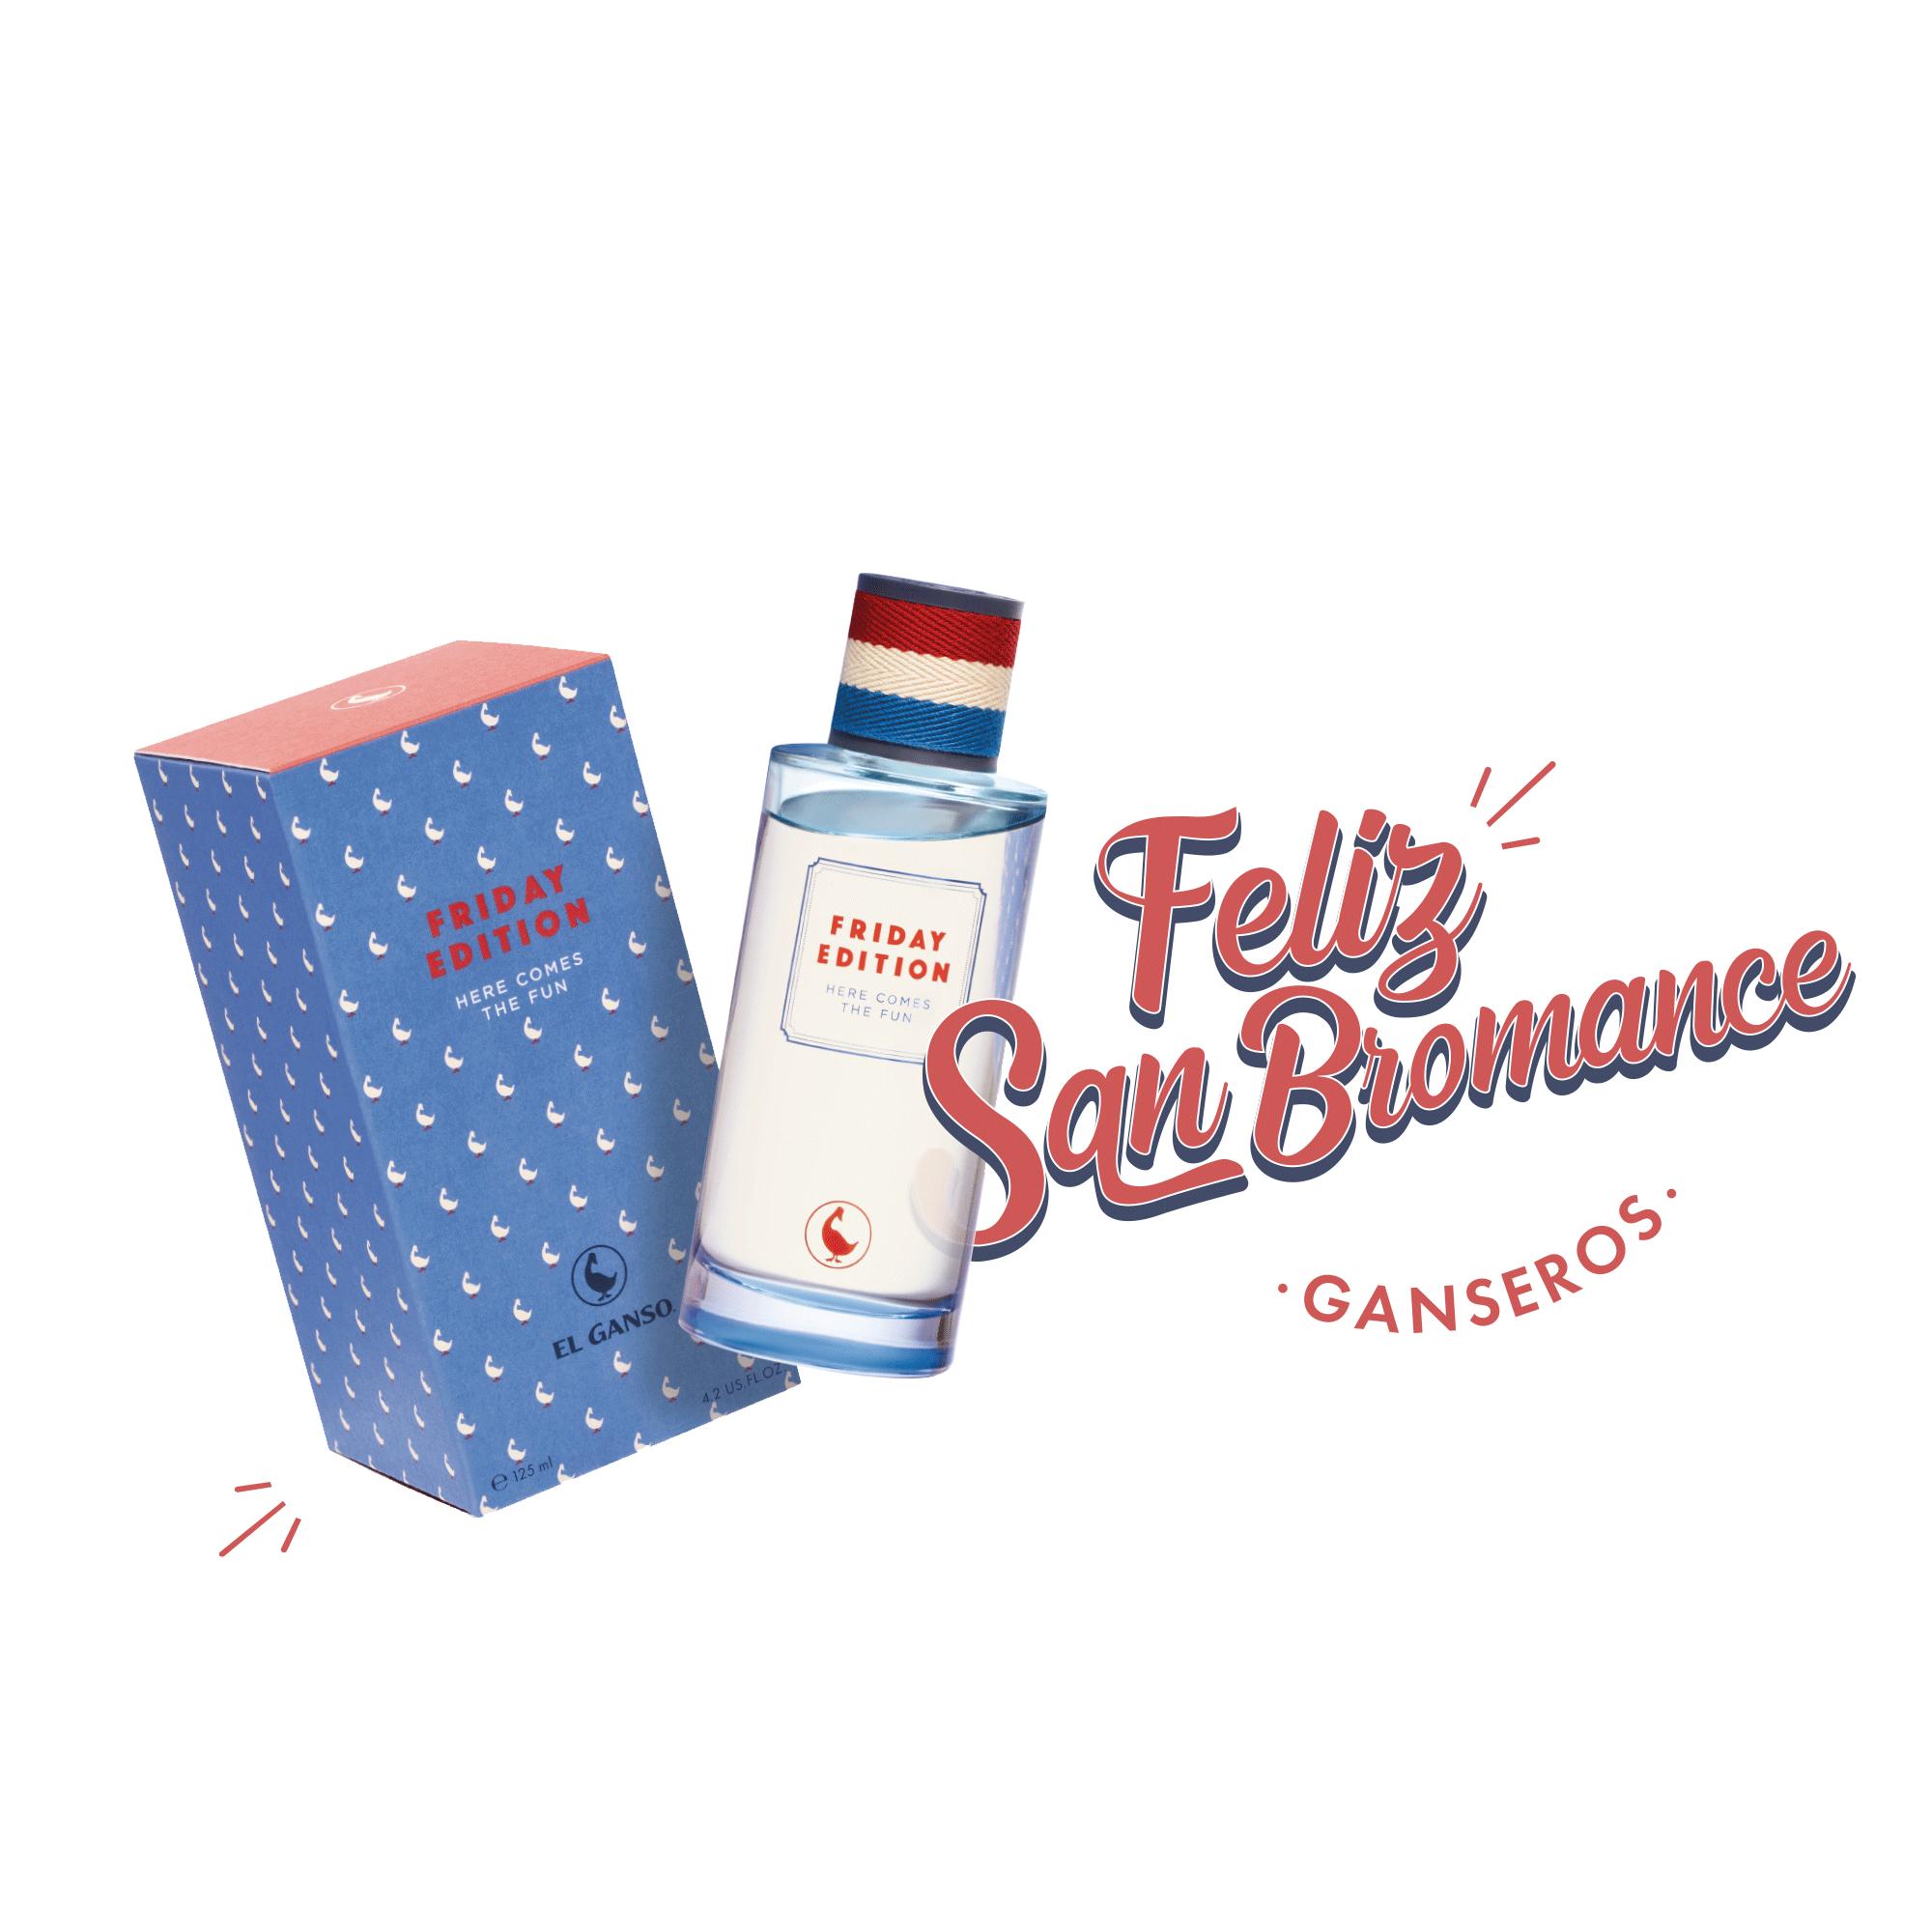 Happy Saint Bromance's month!